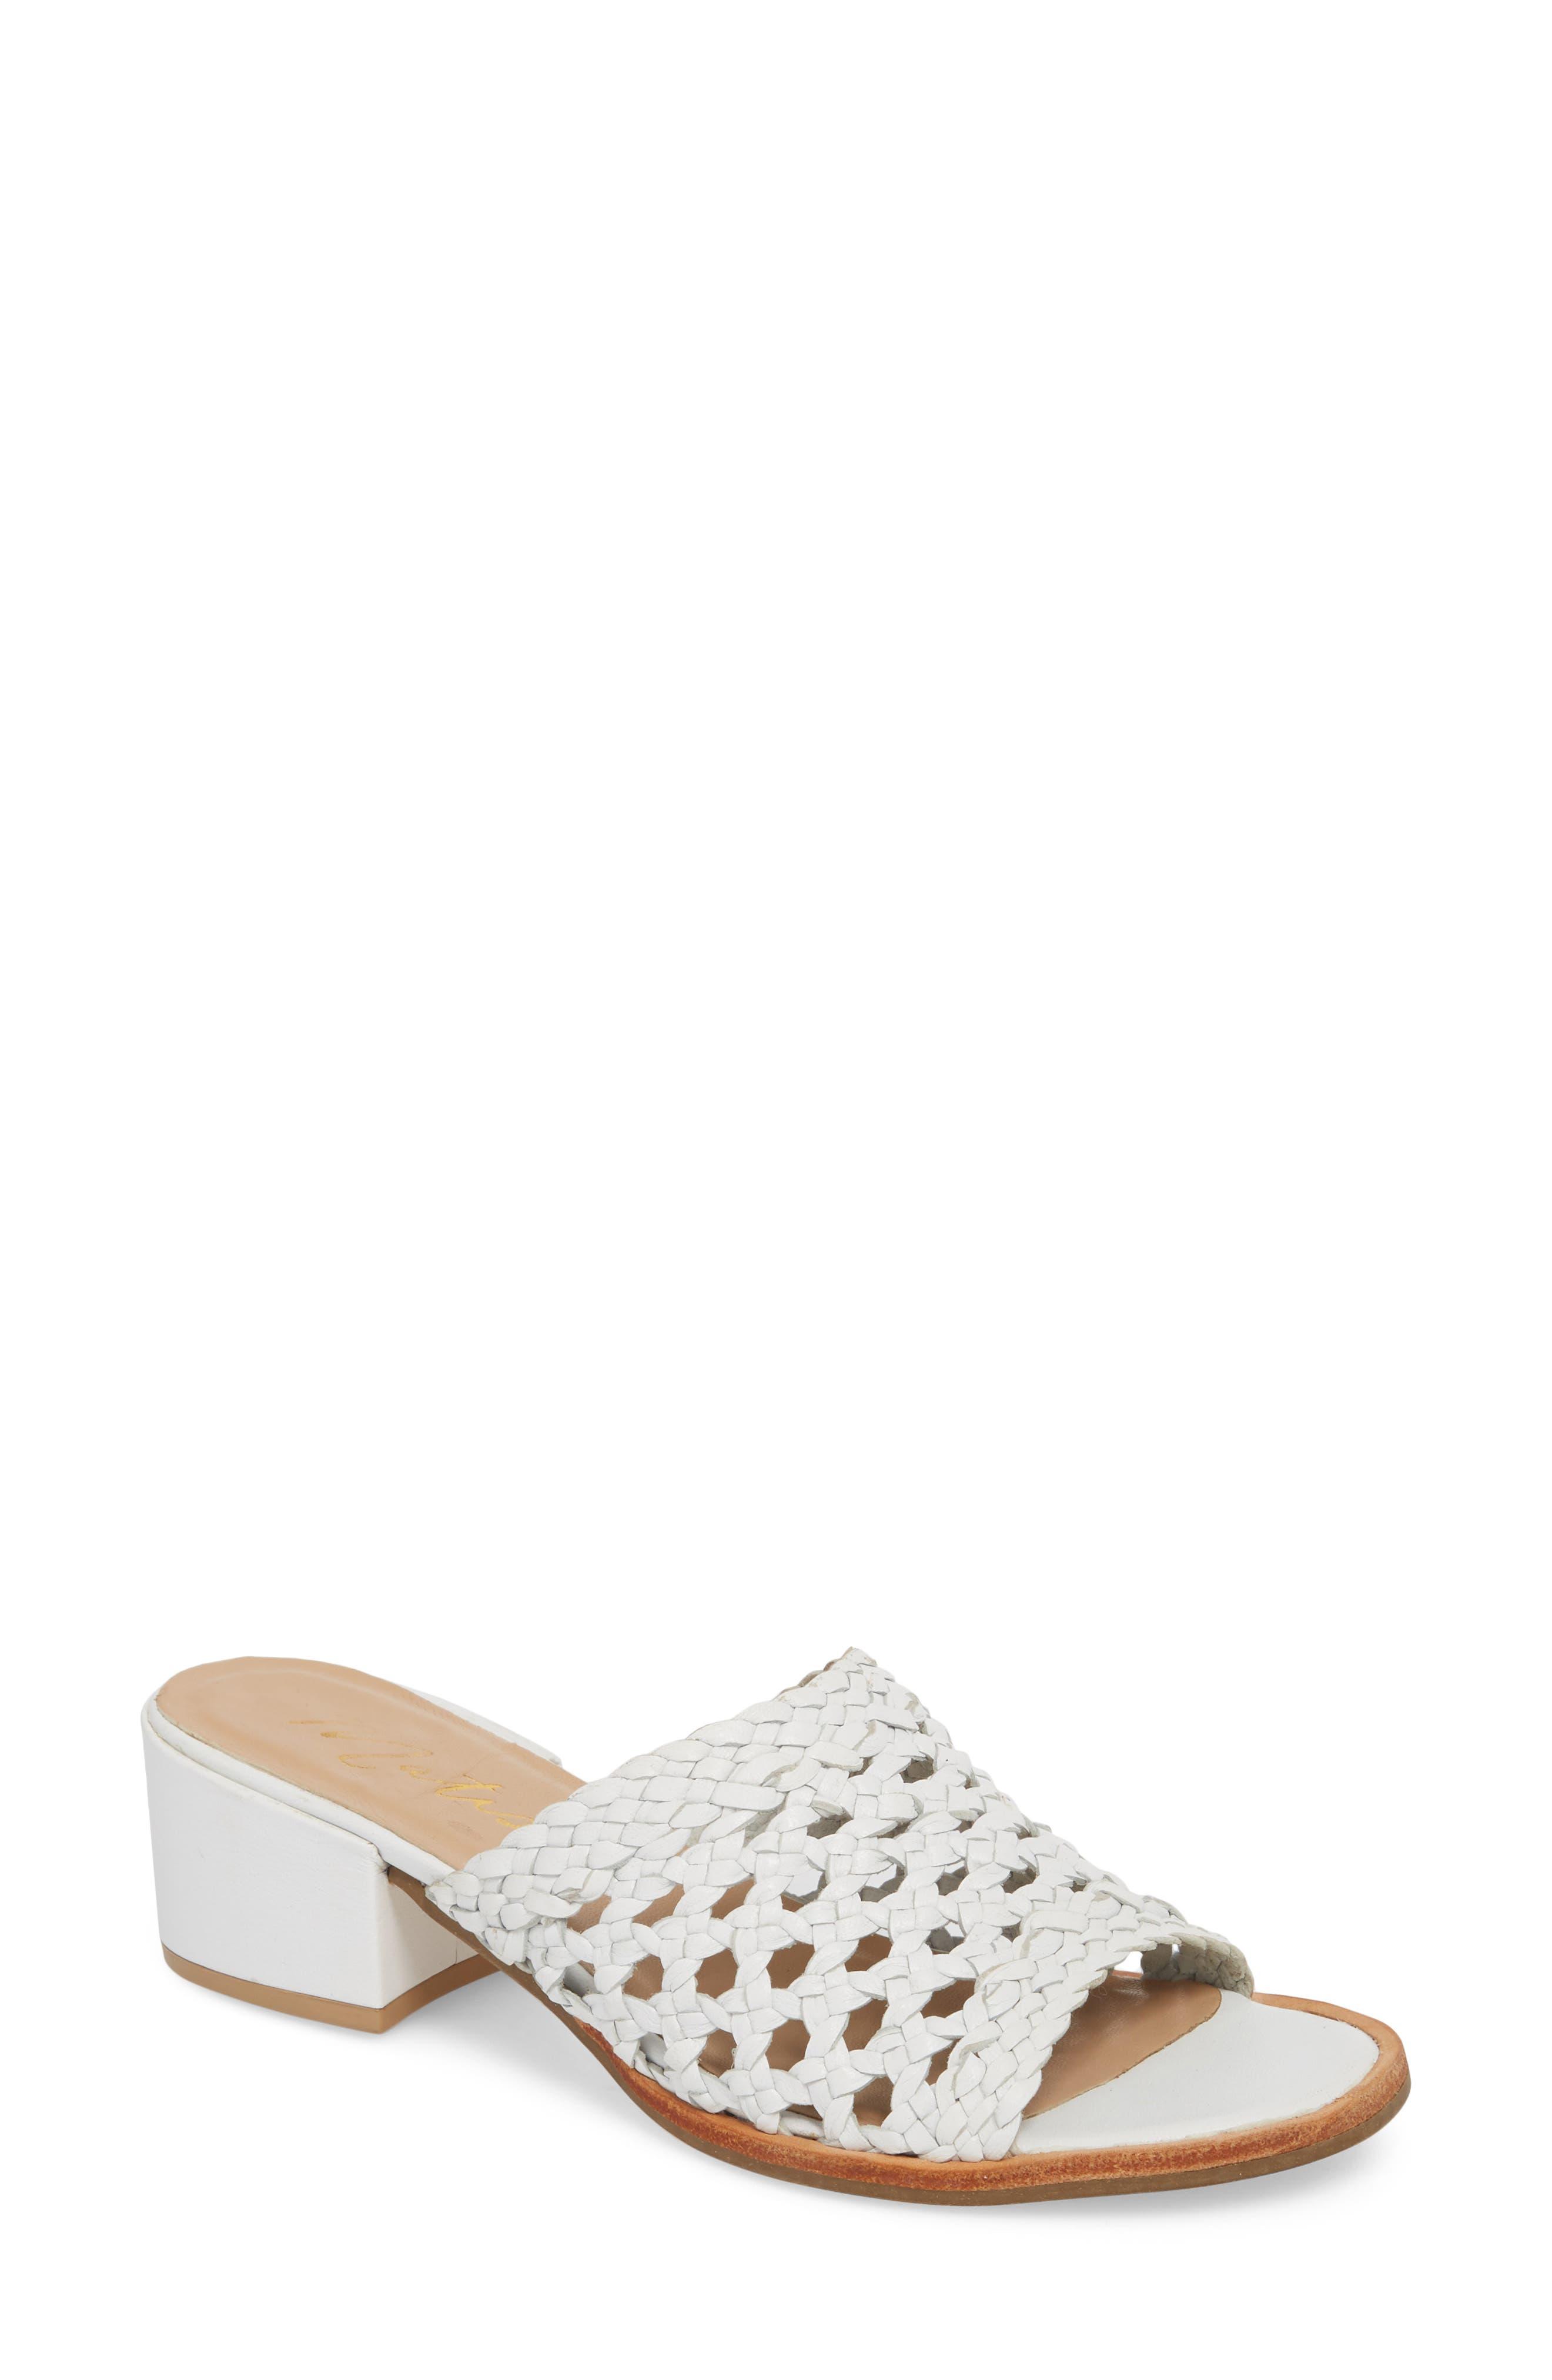 Ditsy Slide Sandal,                         Main,                         color, White Leather